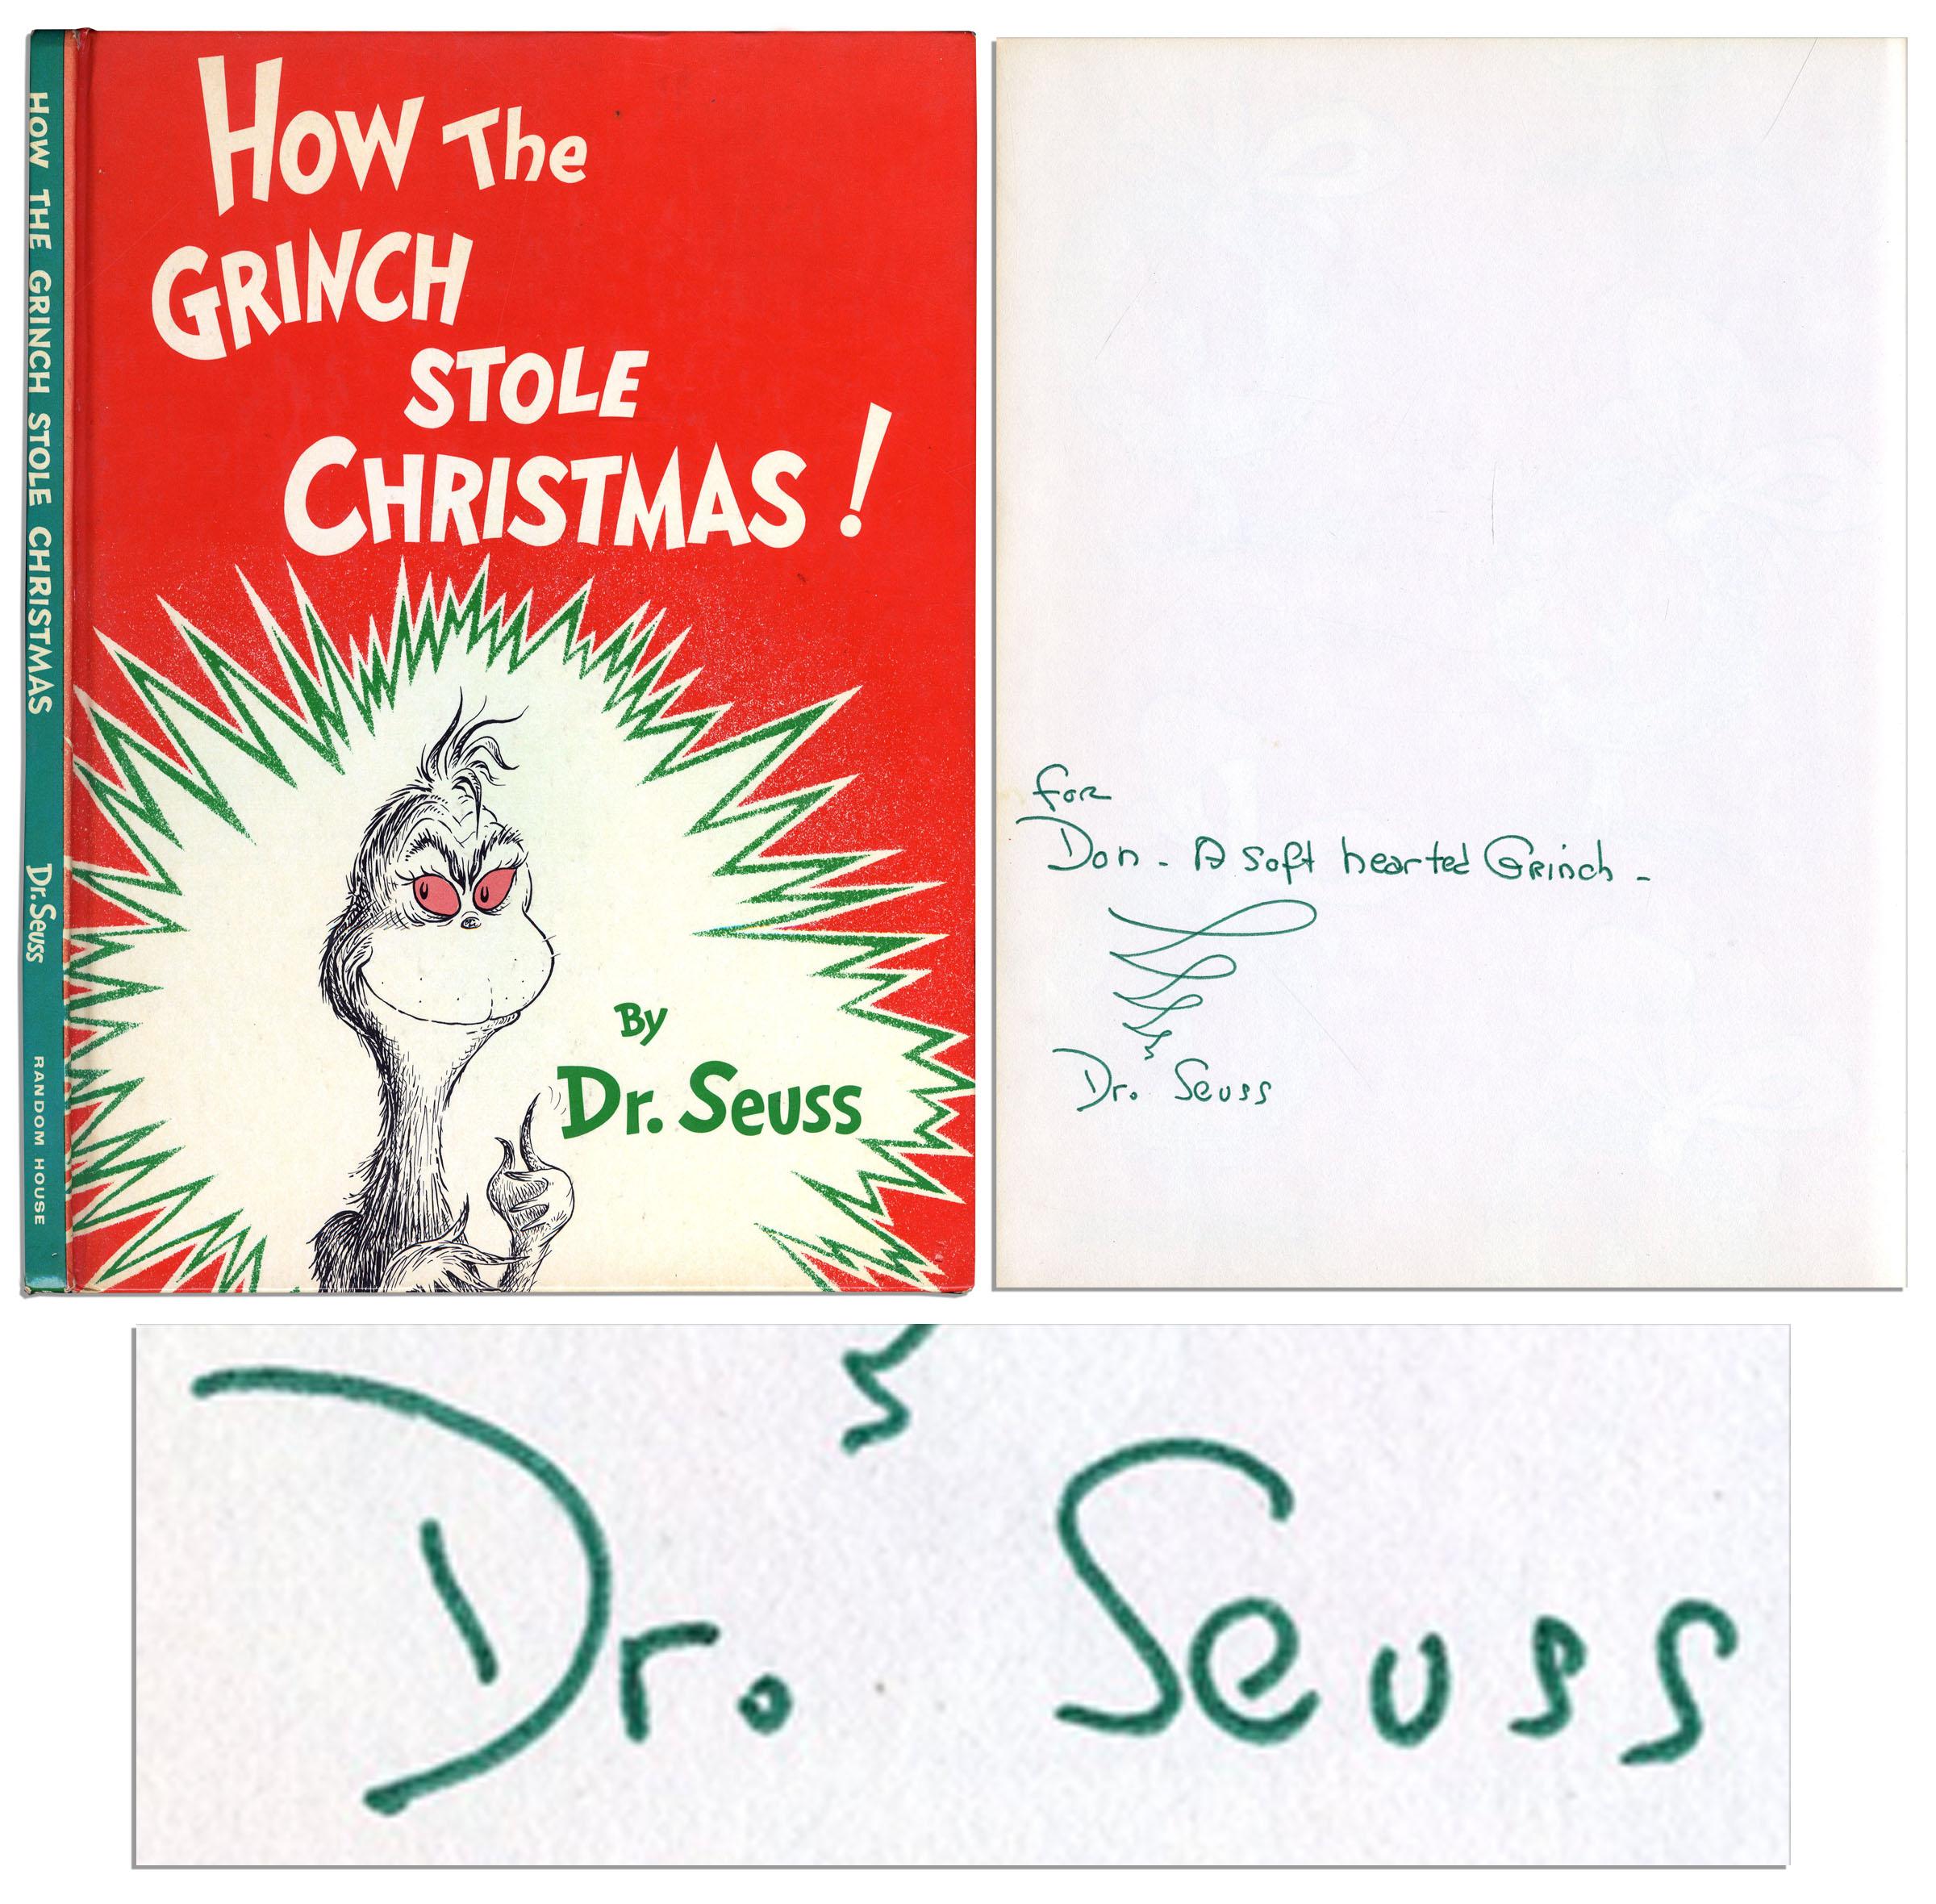 Dr. Seuss Autograph ''How The Grinch Stole Christmas'' Signed by Dr. Seuss & With His Autograph Inscription